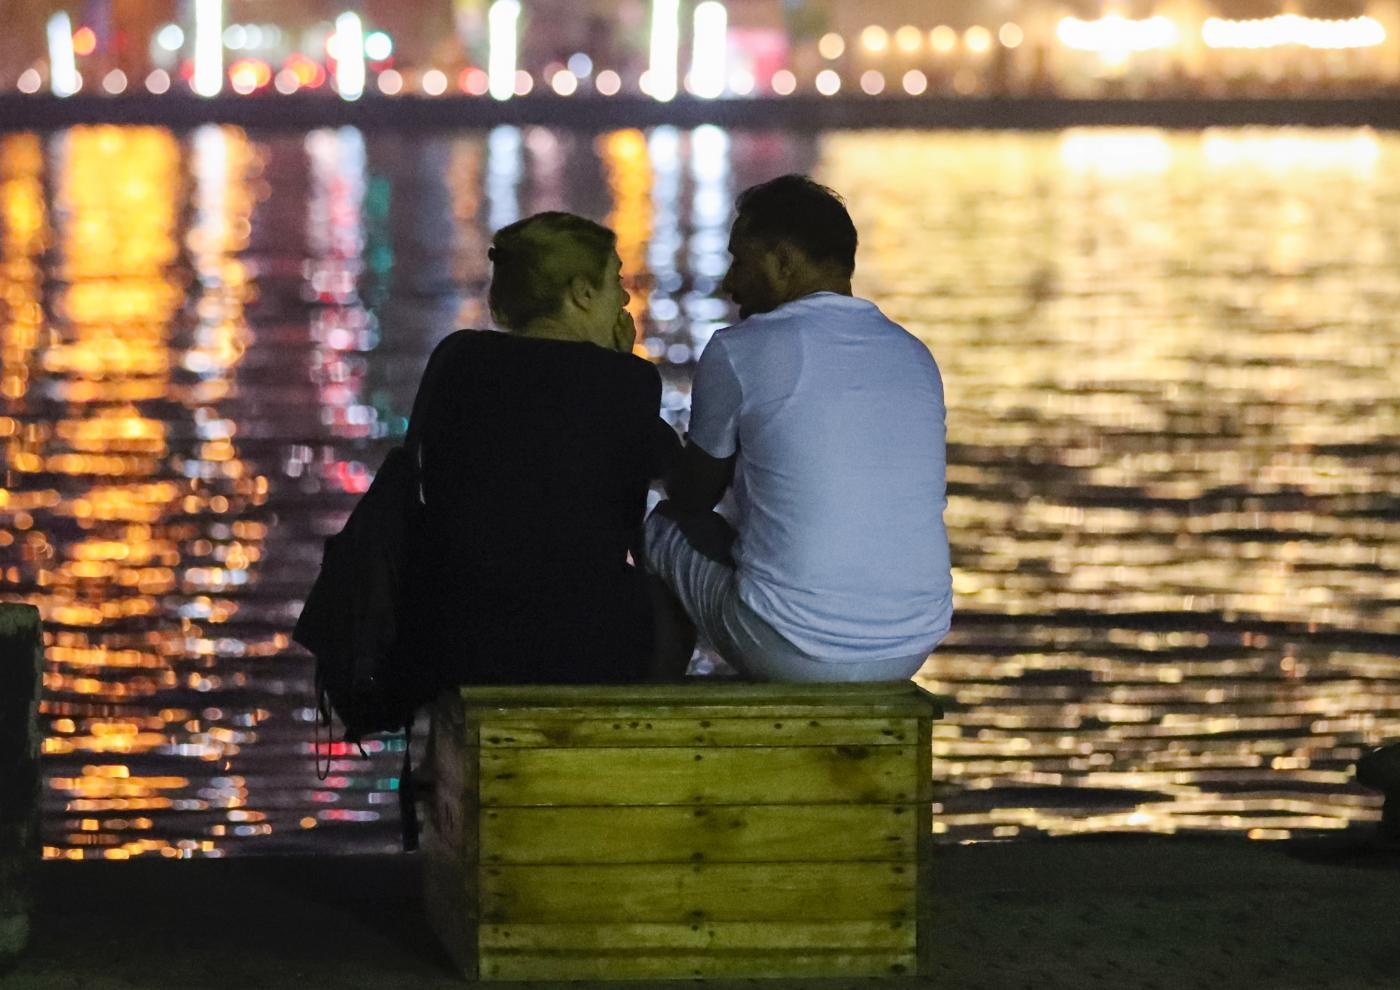 Dubai suspends marriage and divorce filings to curb spread of Coronavirus